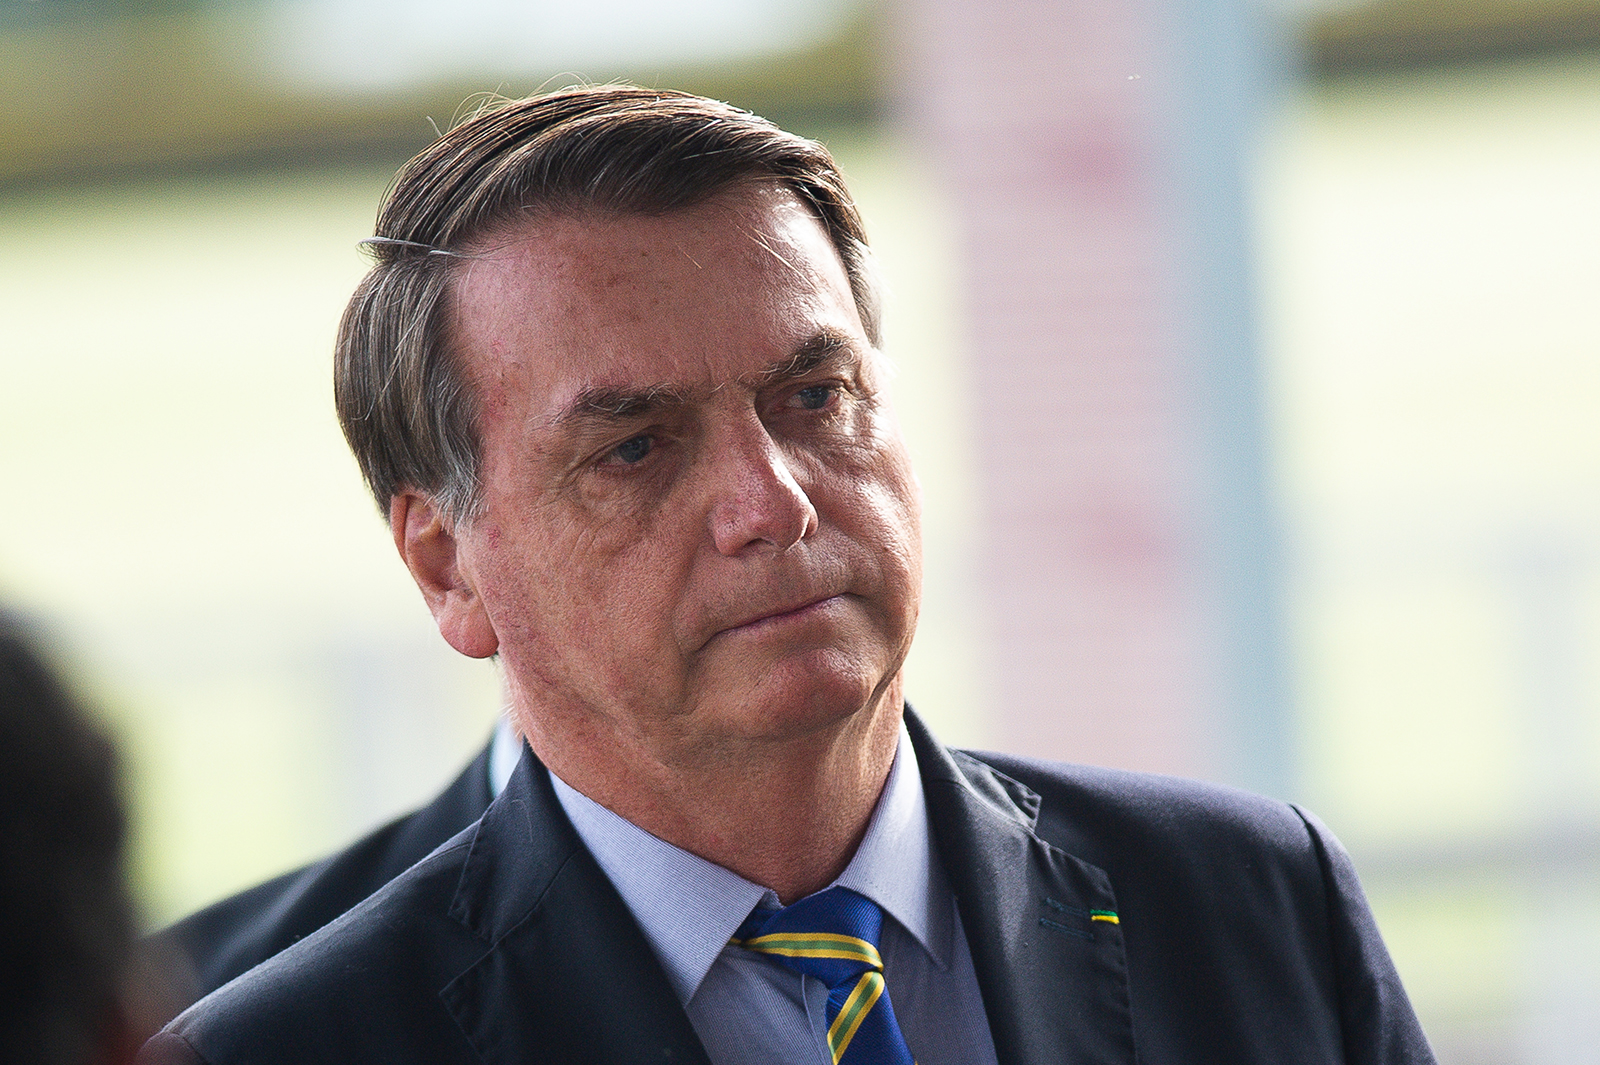 Brazilian President Jair Bolsonaro talks to supporters of his government on Wednesday, May 6, in Brasilia.